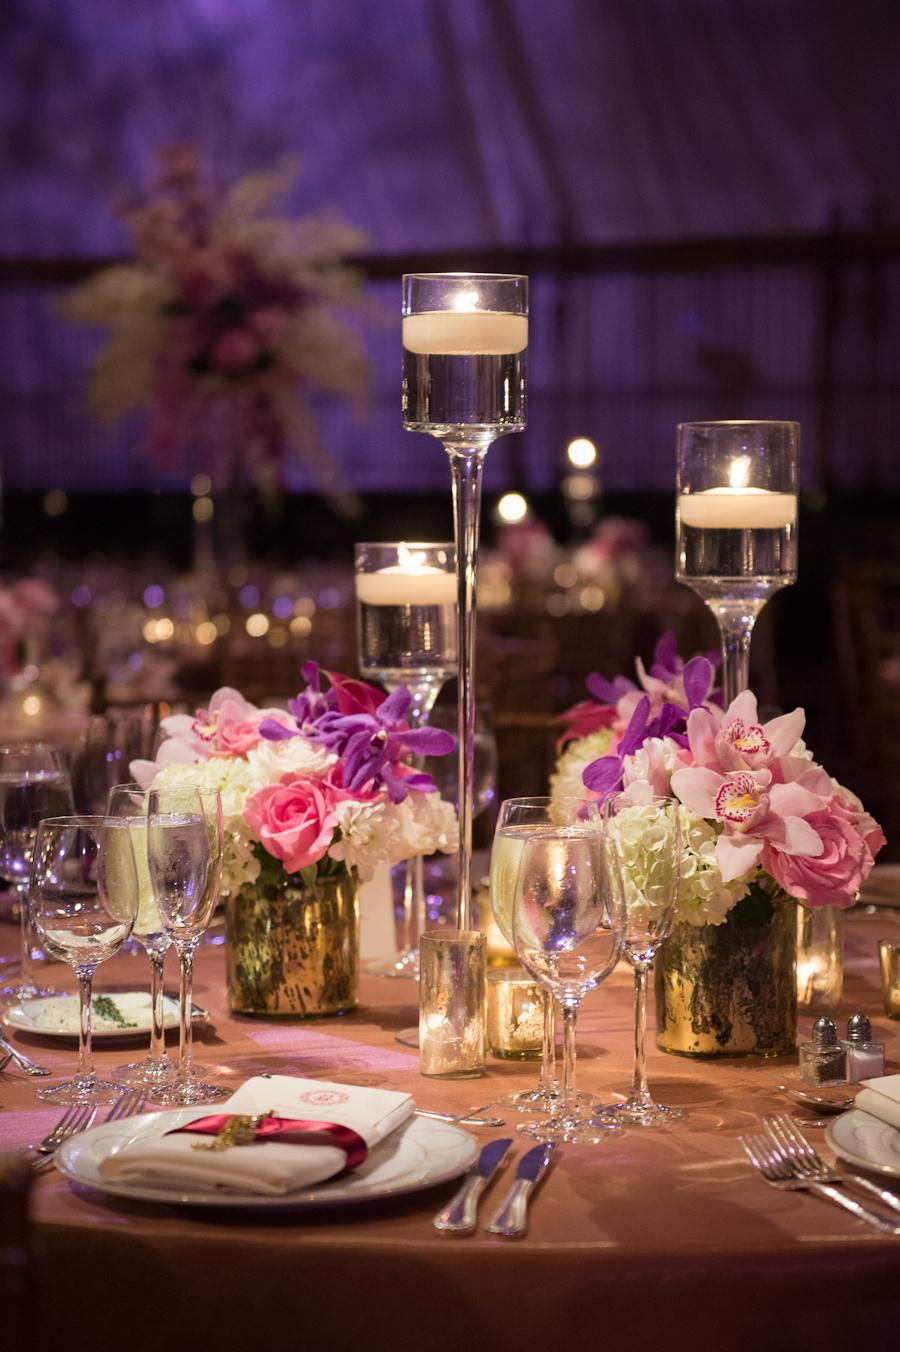 gotham hall brian hatton ang weddings and events-33.jpg